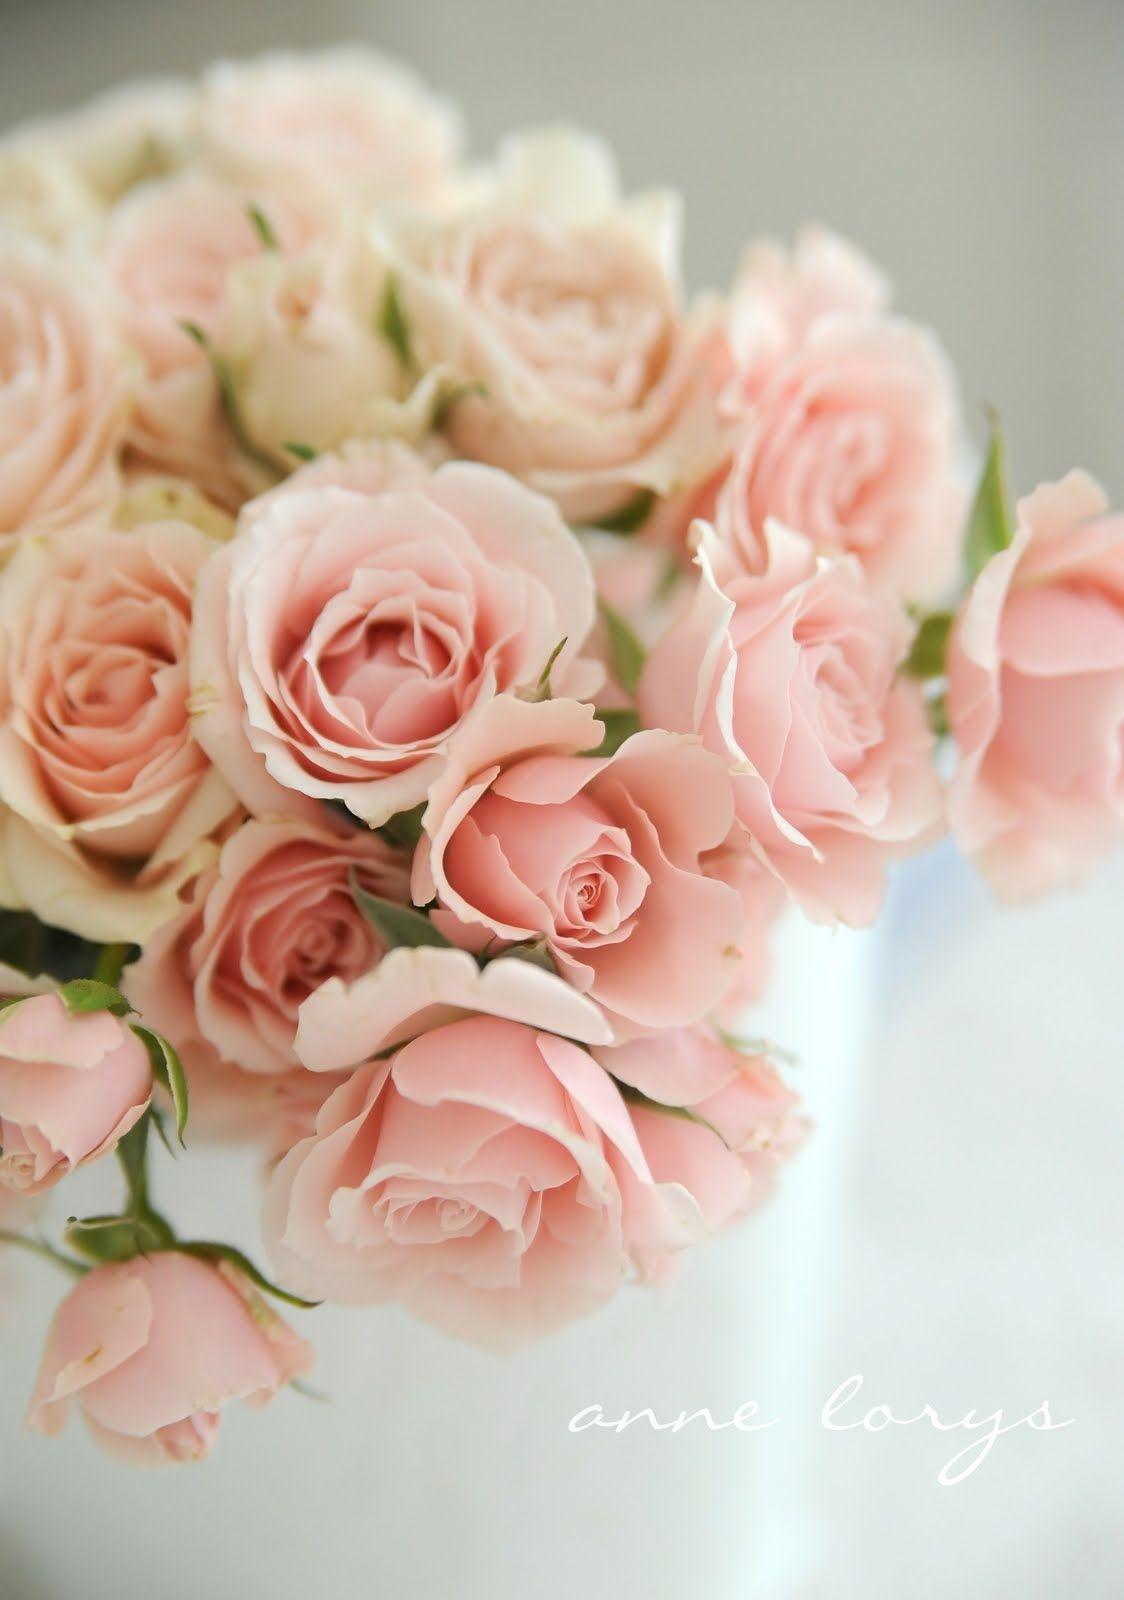 The Prettiest Pink Roses Via Ann Lorys My Favorite Color